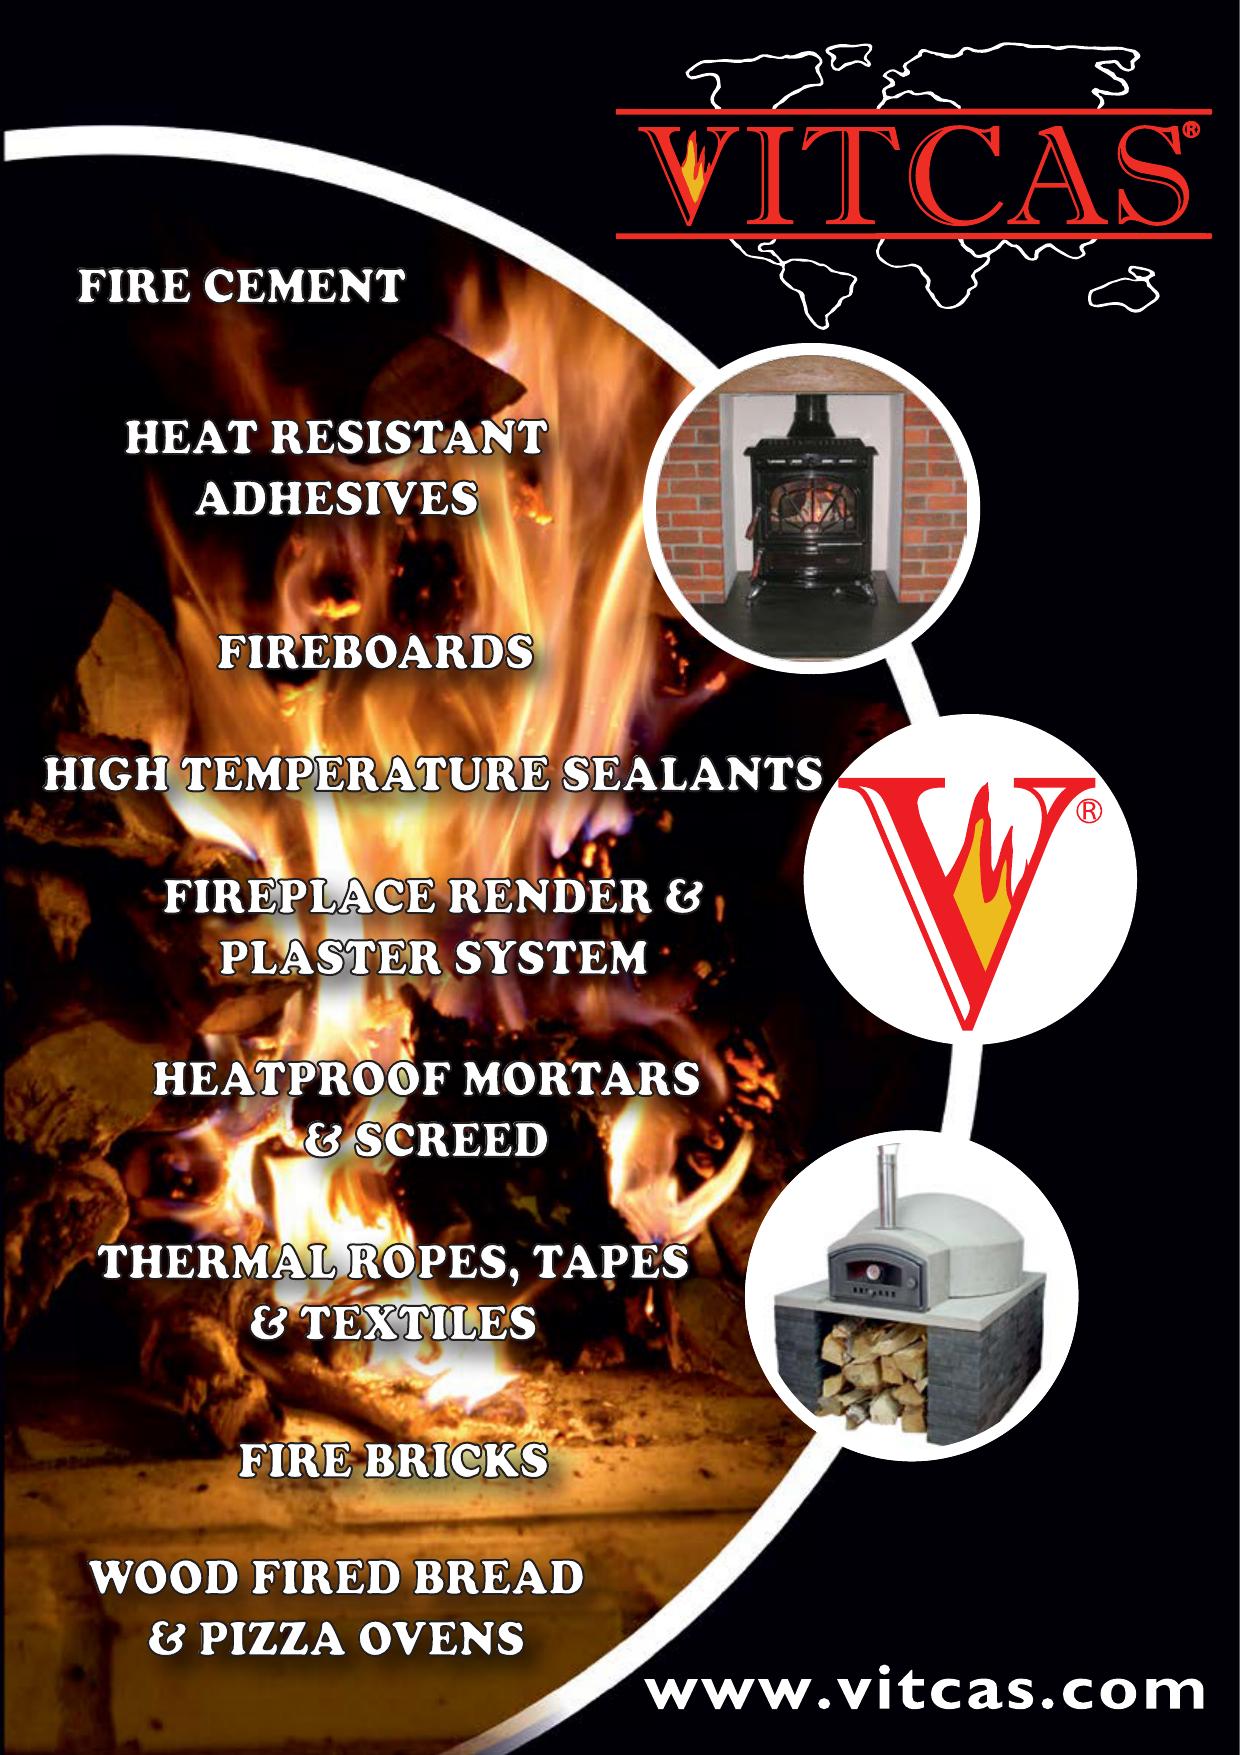 20Kg VITCAS Fireplace Render